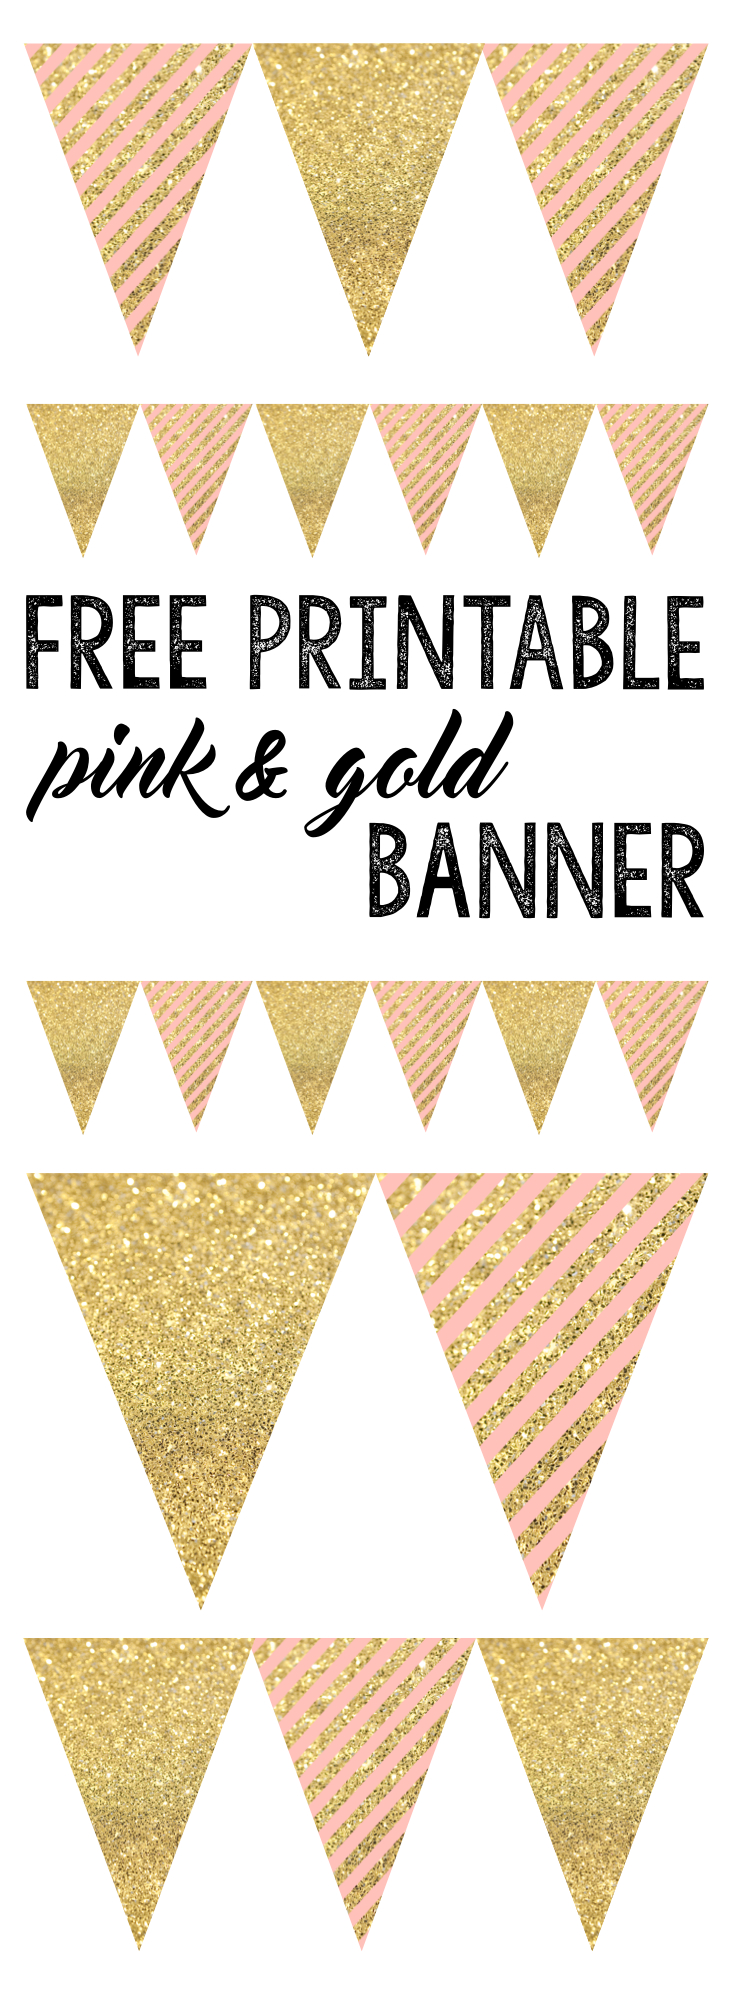 pink-gold-banner-long